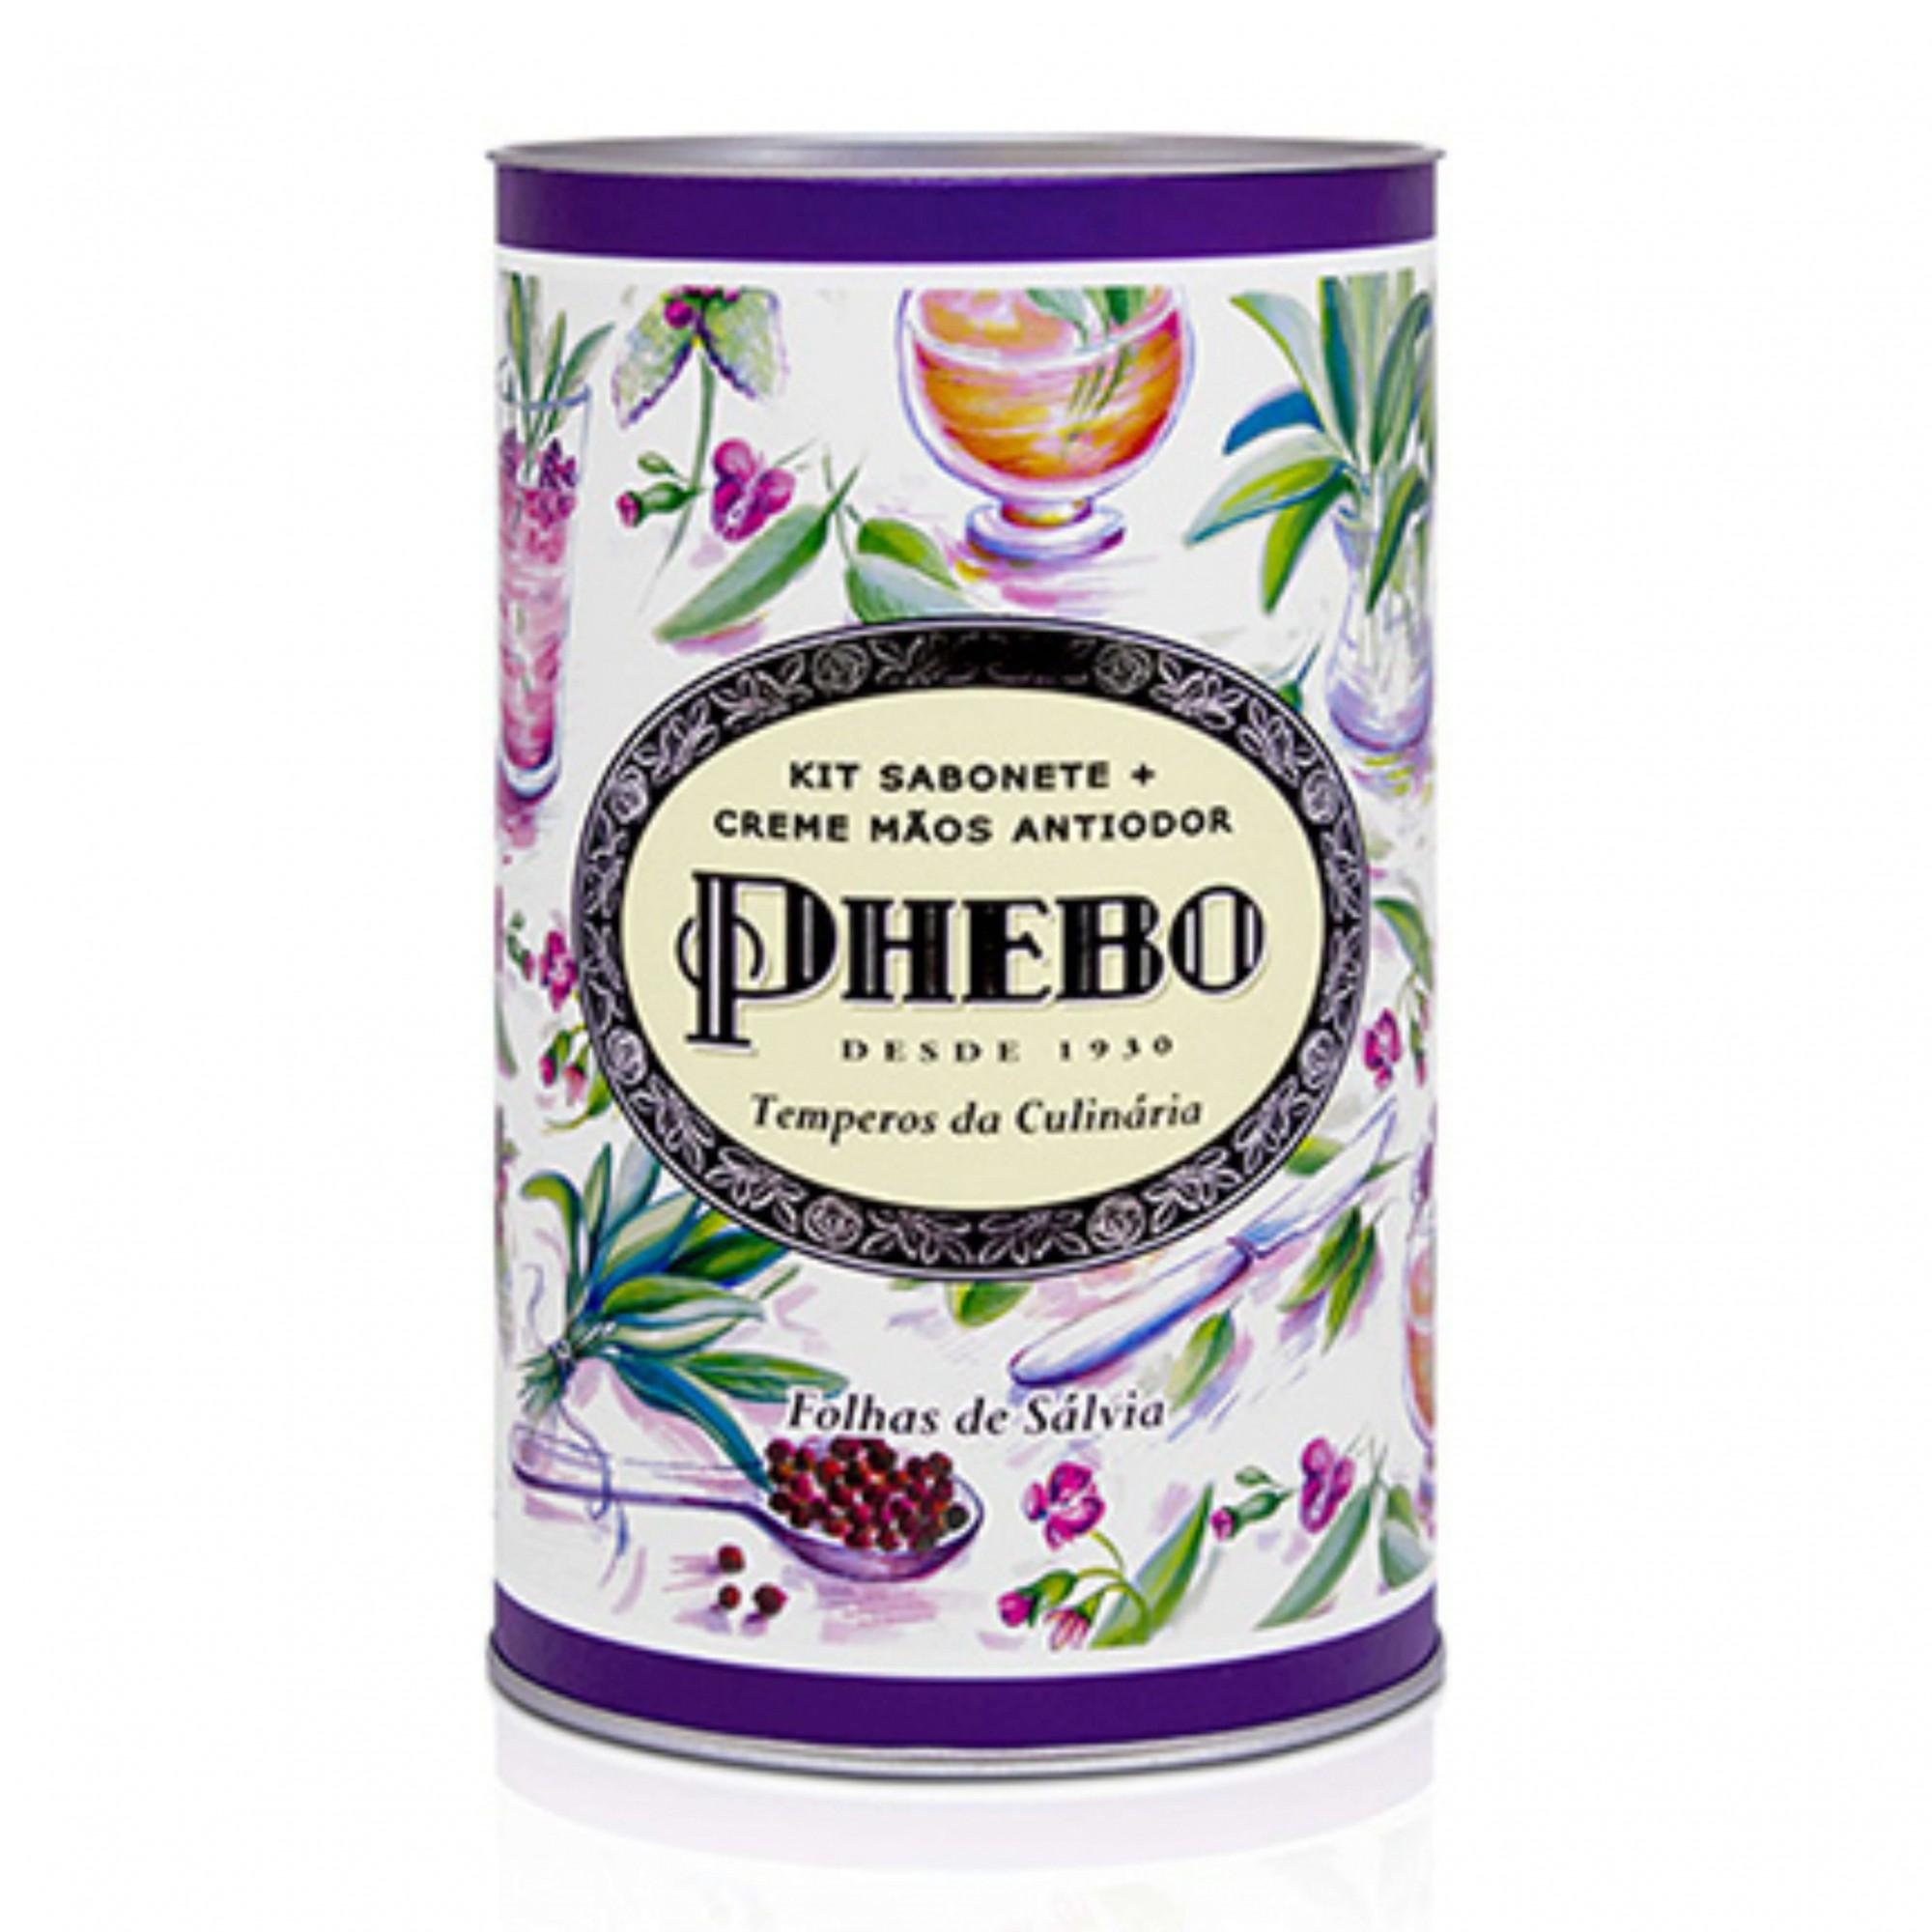 Kit Mãos Phebo Tempero Folhas de Salvia